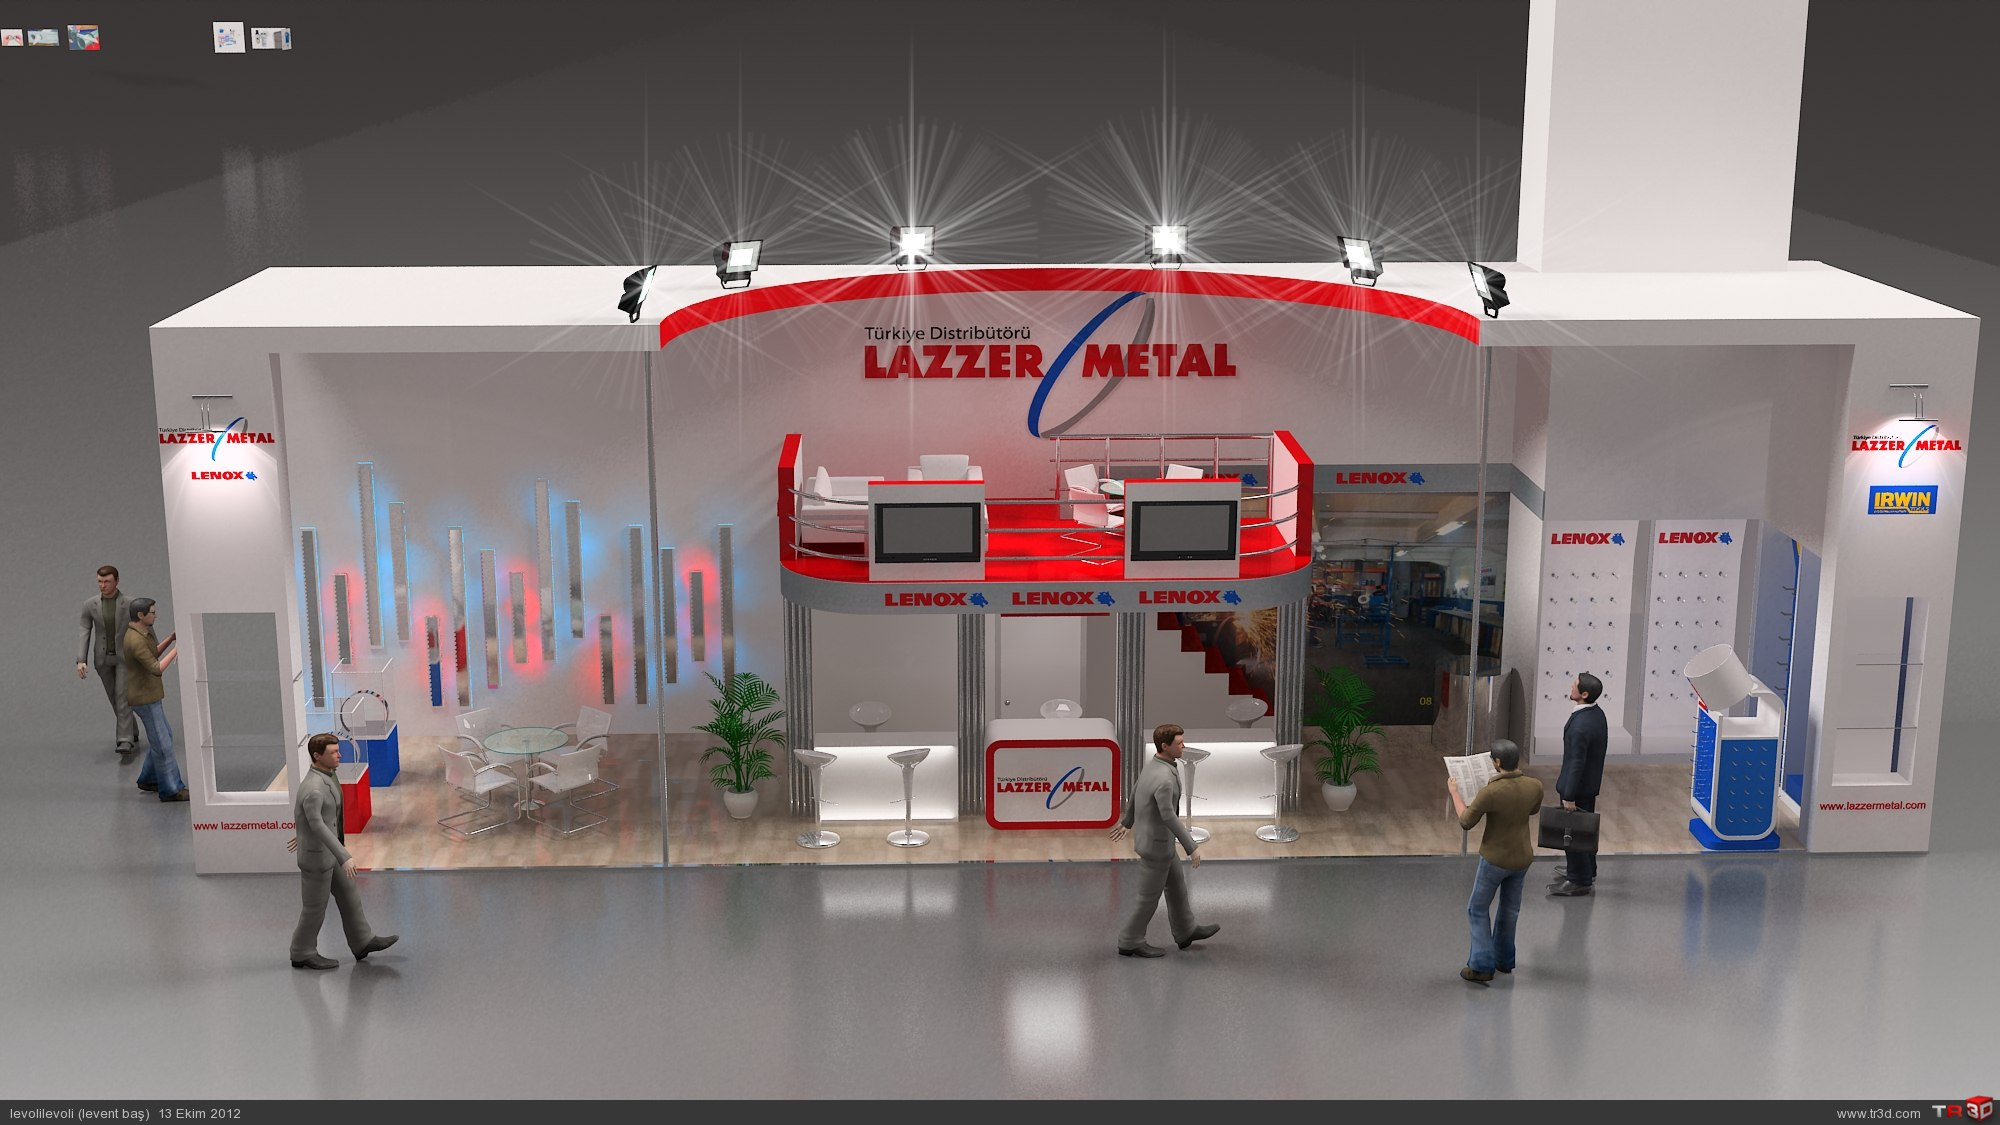 Lazzer Metal (Tatef Fuarı) 1